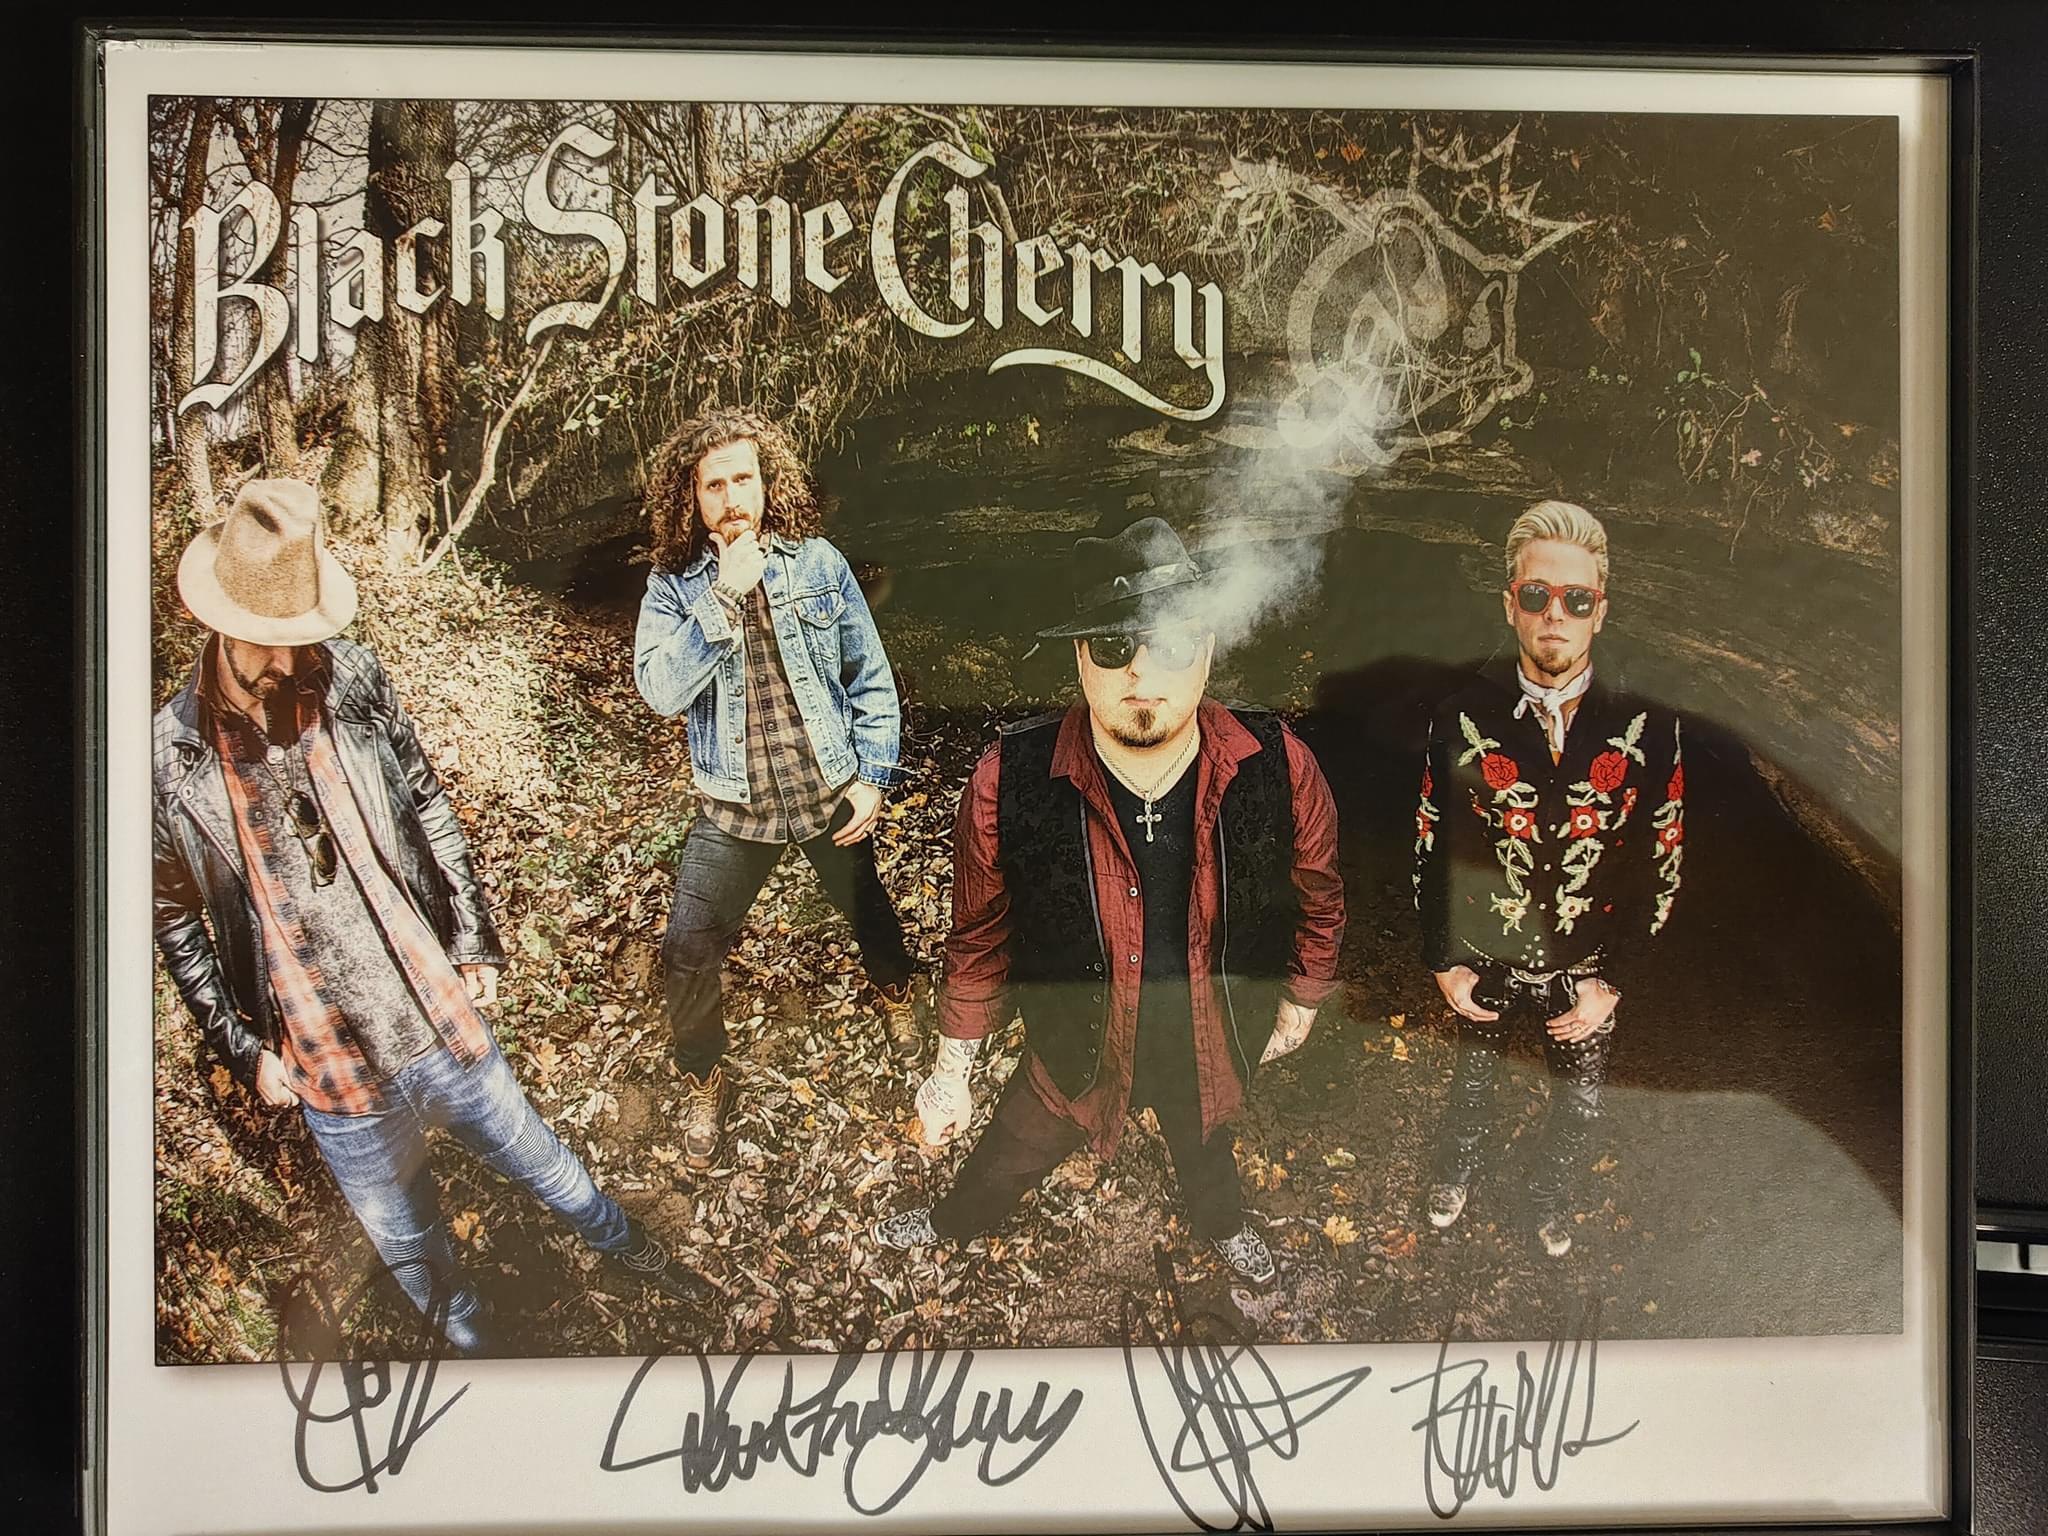 Blackstone Cherry band autographed 8x10 photo donated by Corey Hanson